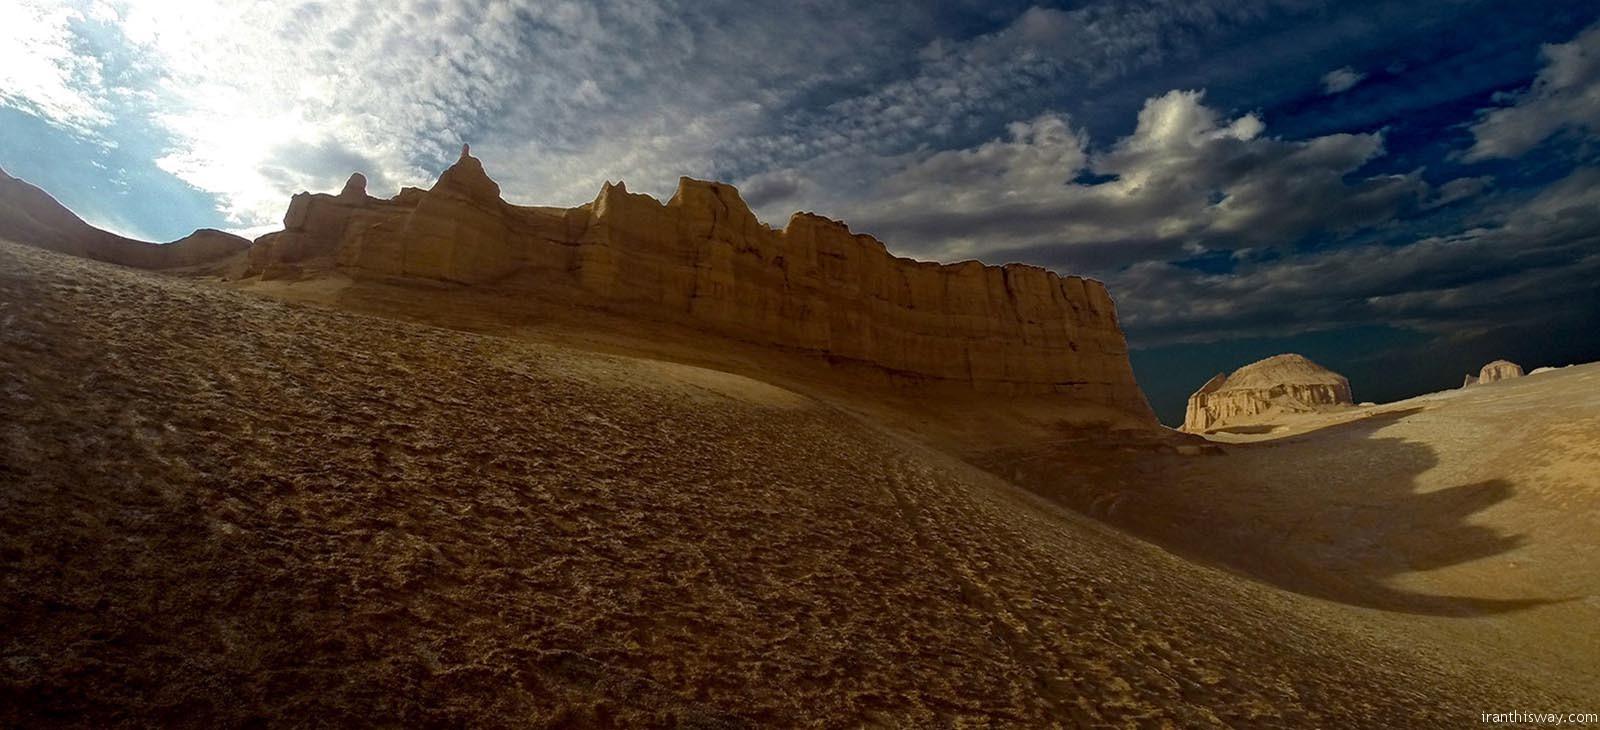 Kerman desert, Iran